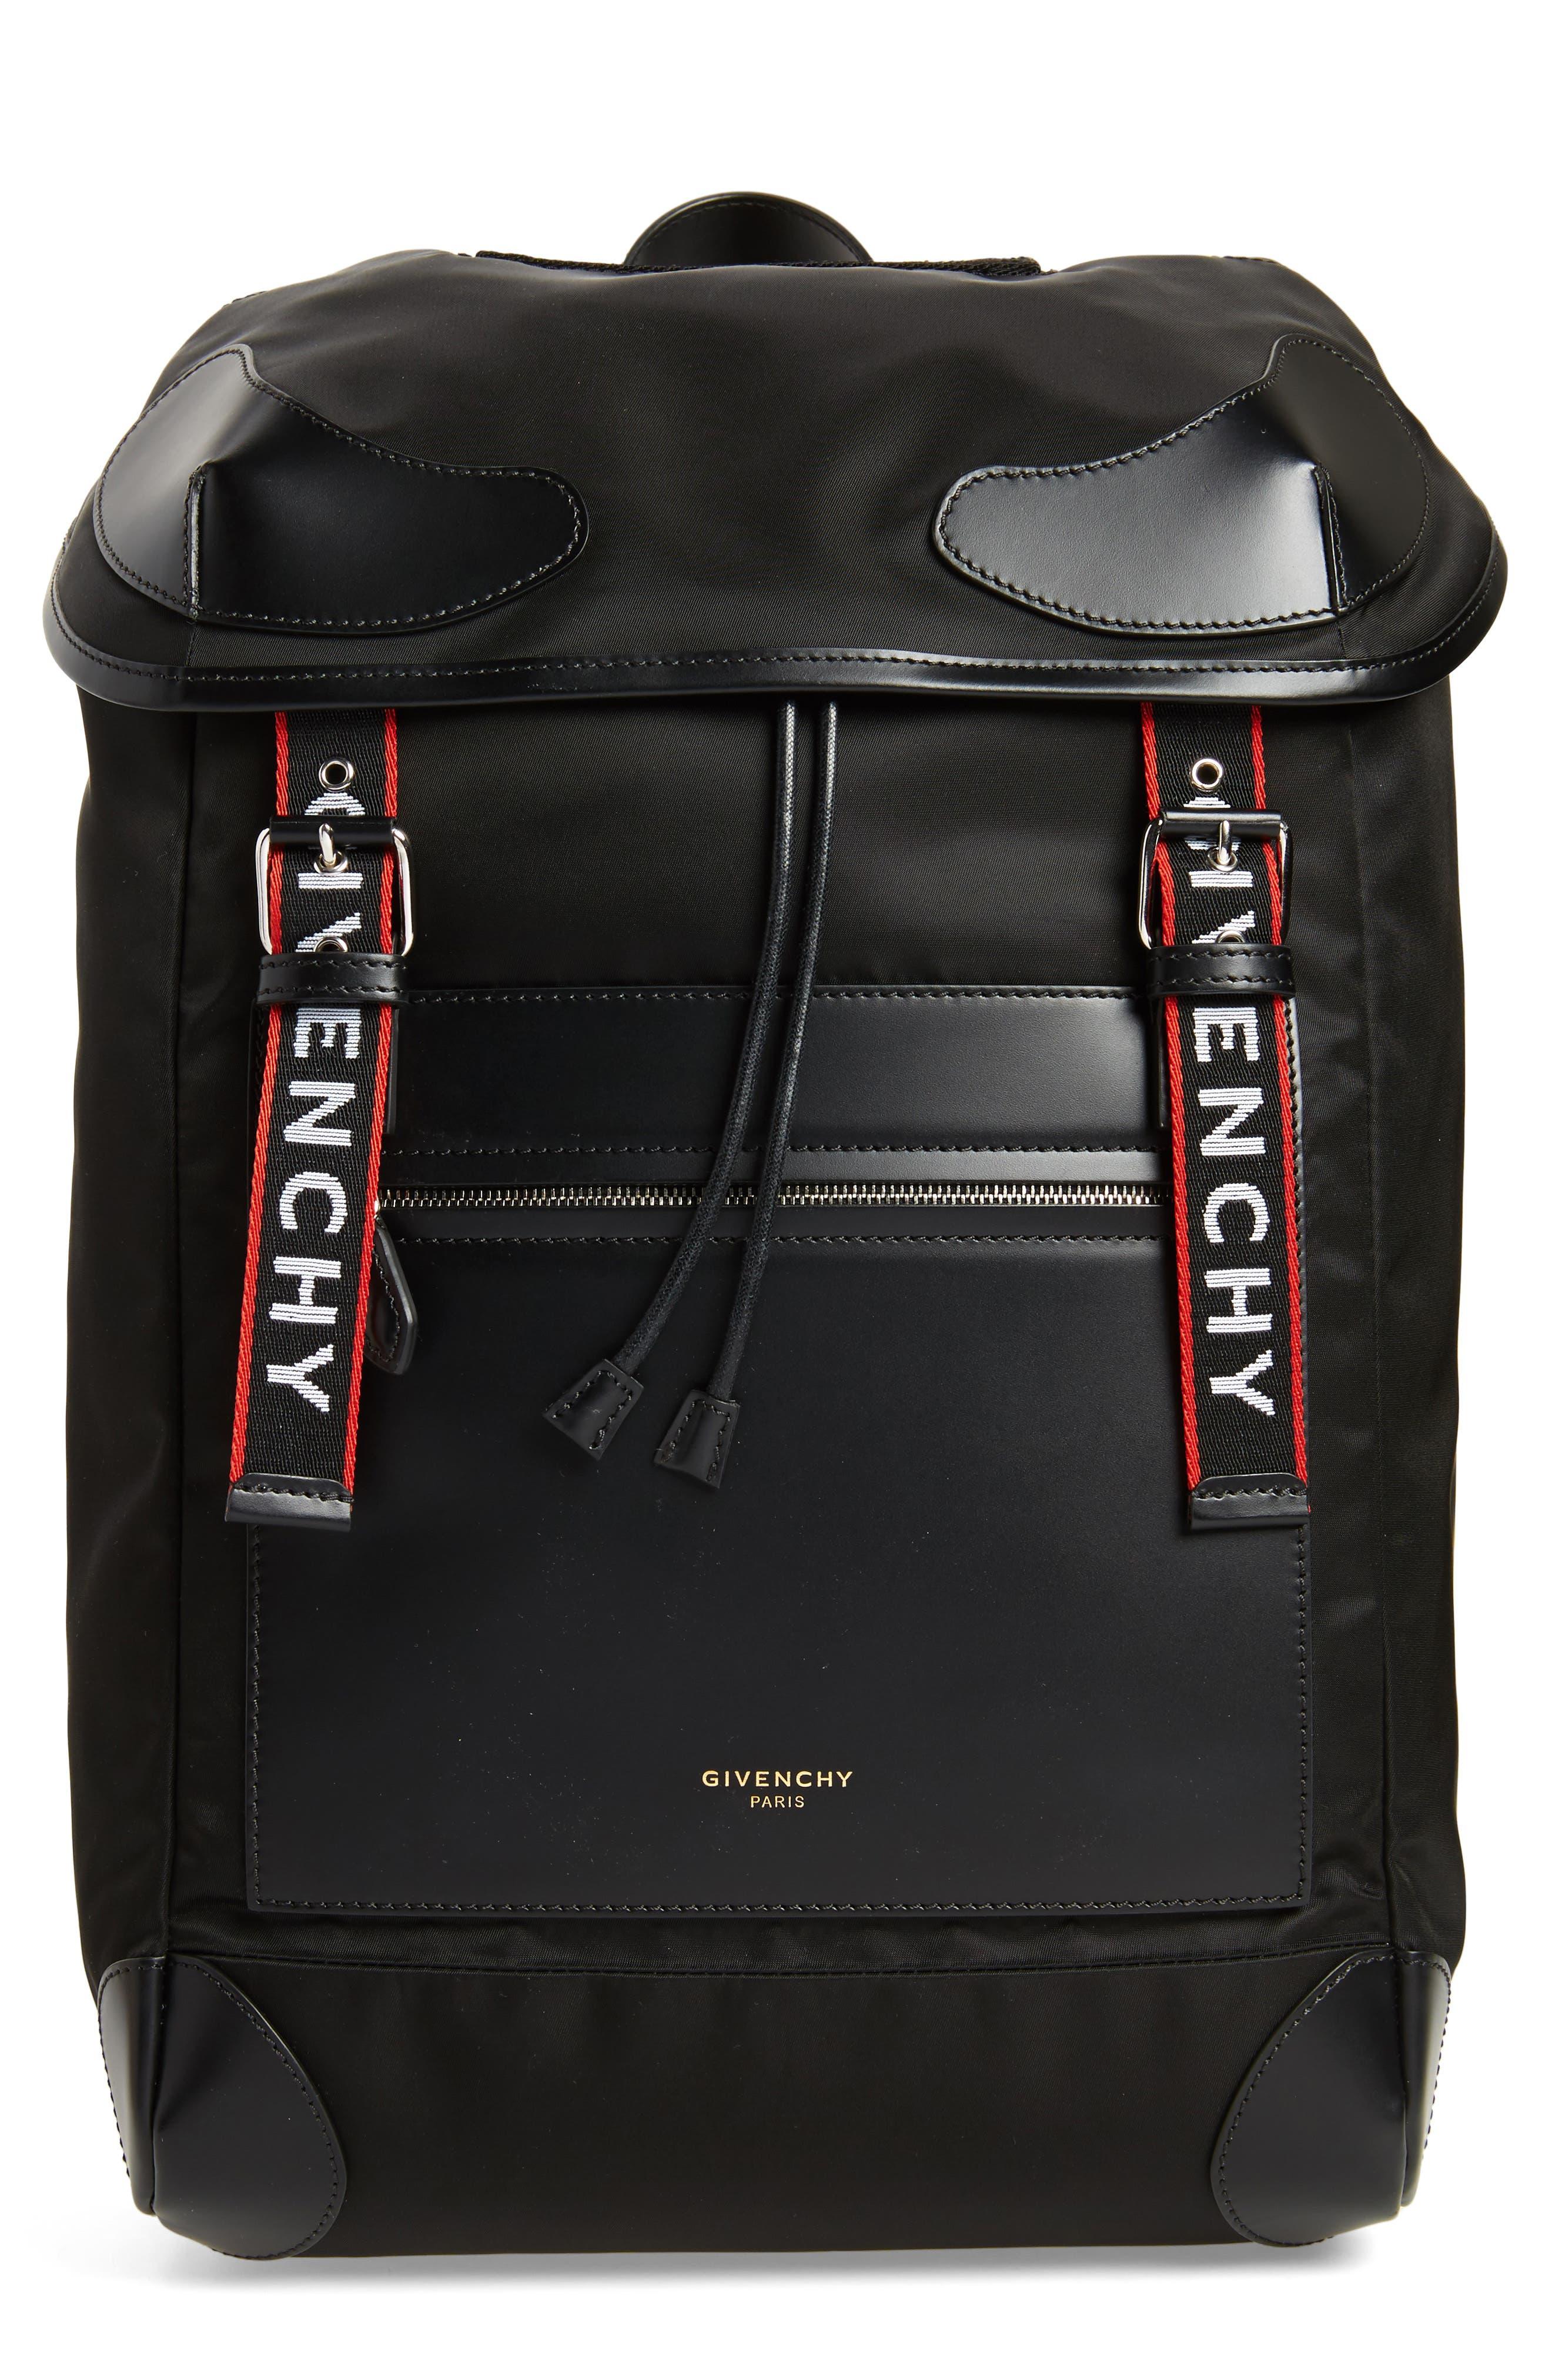 Givenchy Rider Backpack